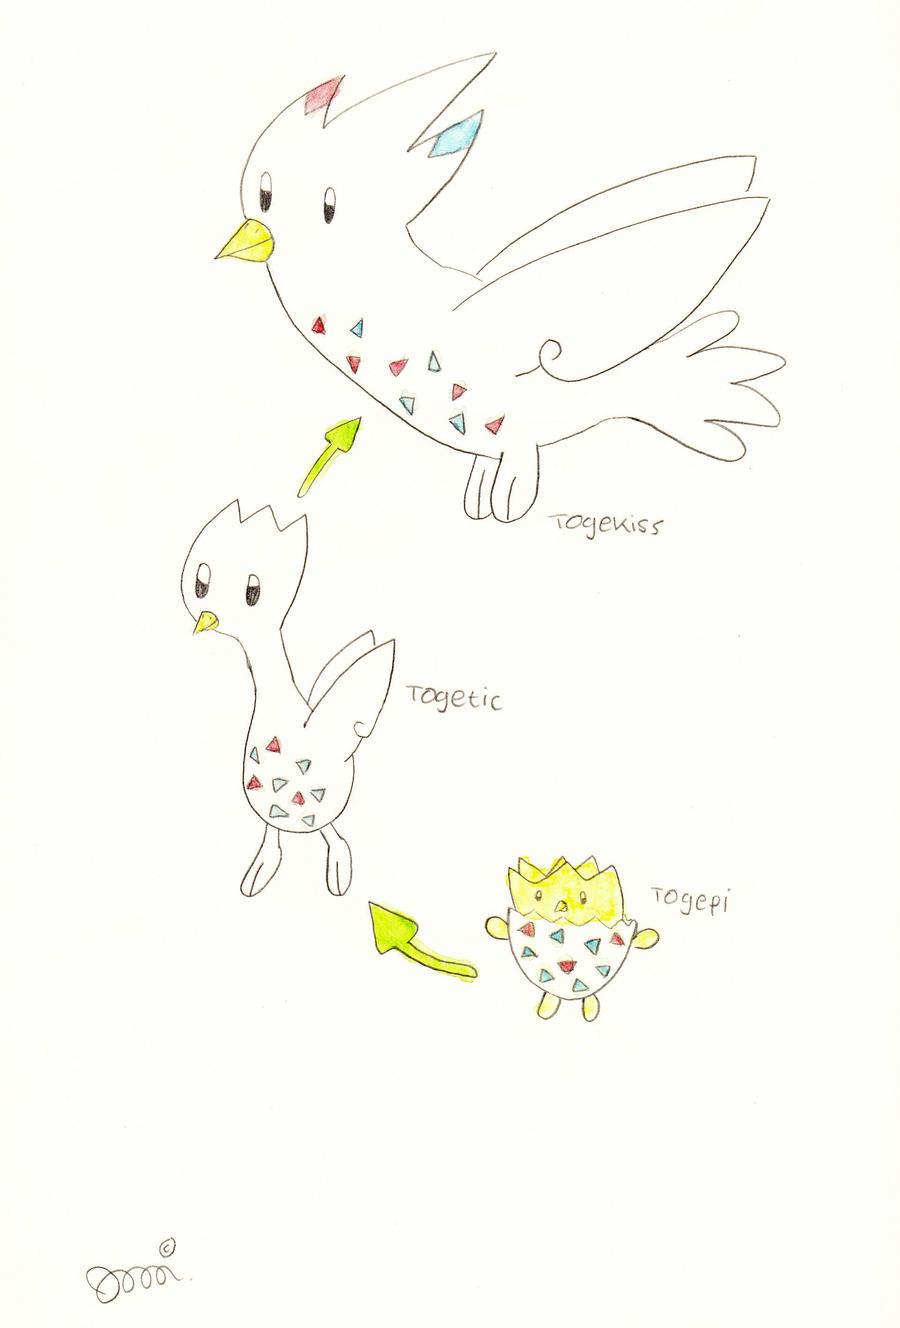 Pokemon Togepi Evolution Images | Pokemon Images